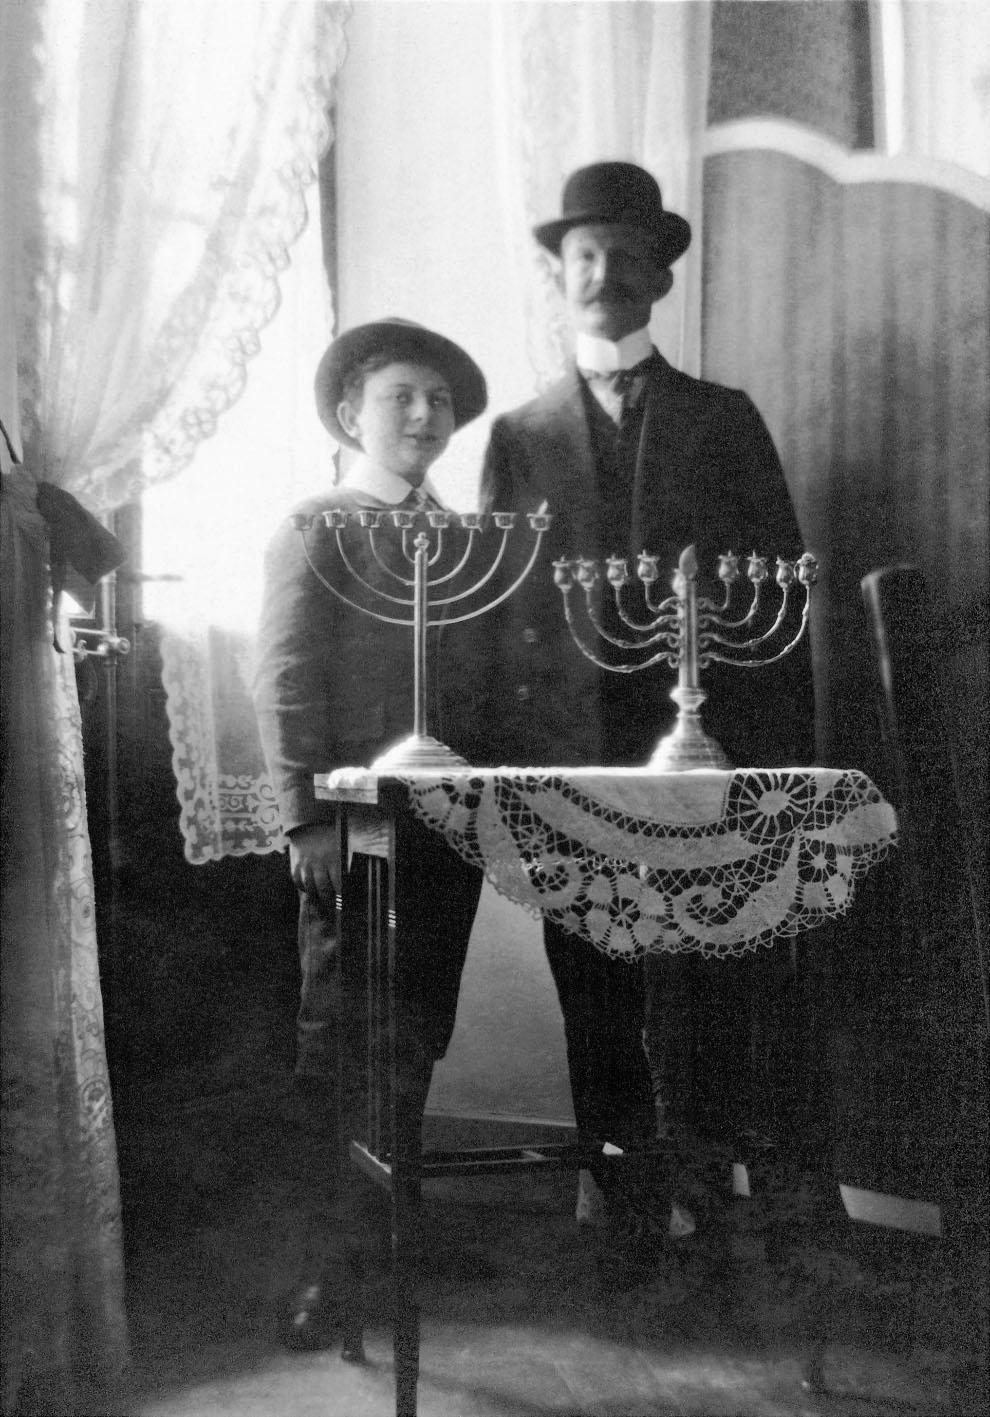 Vater Naphtali Fromm und Sohn Erich, Ende Dezember 1913, in Montreux.